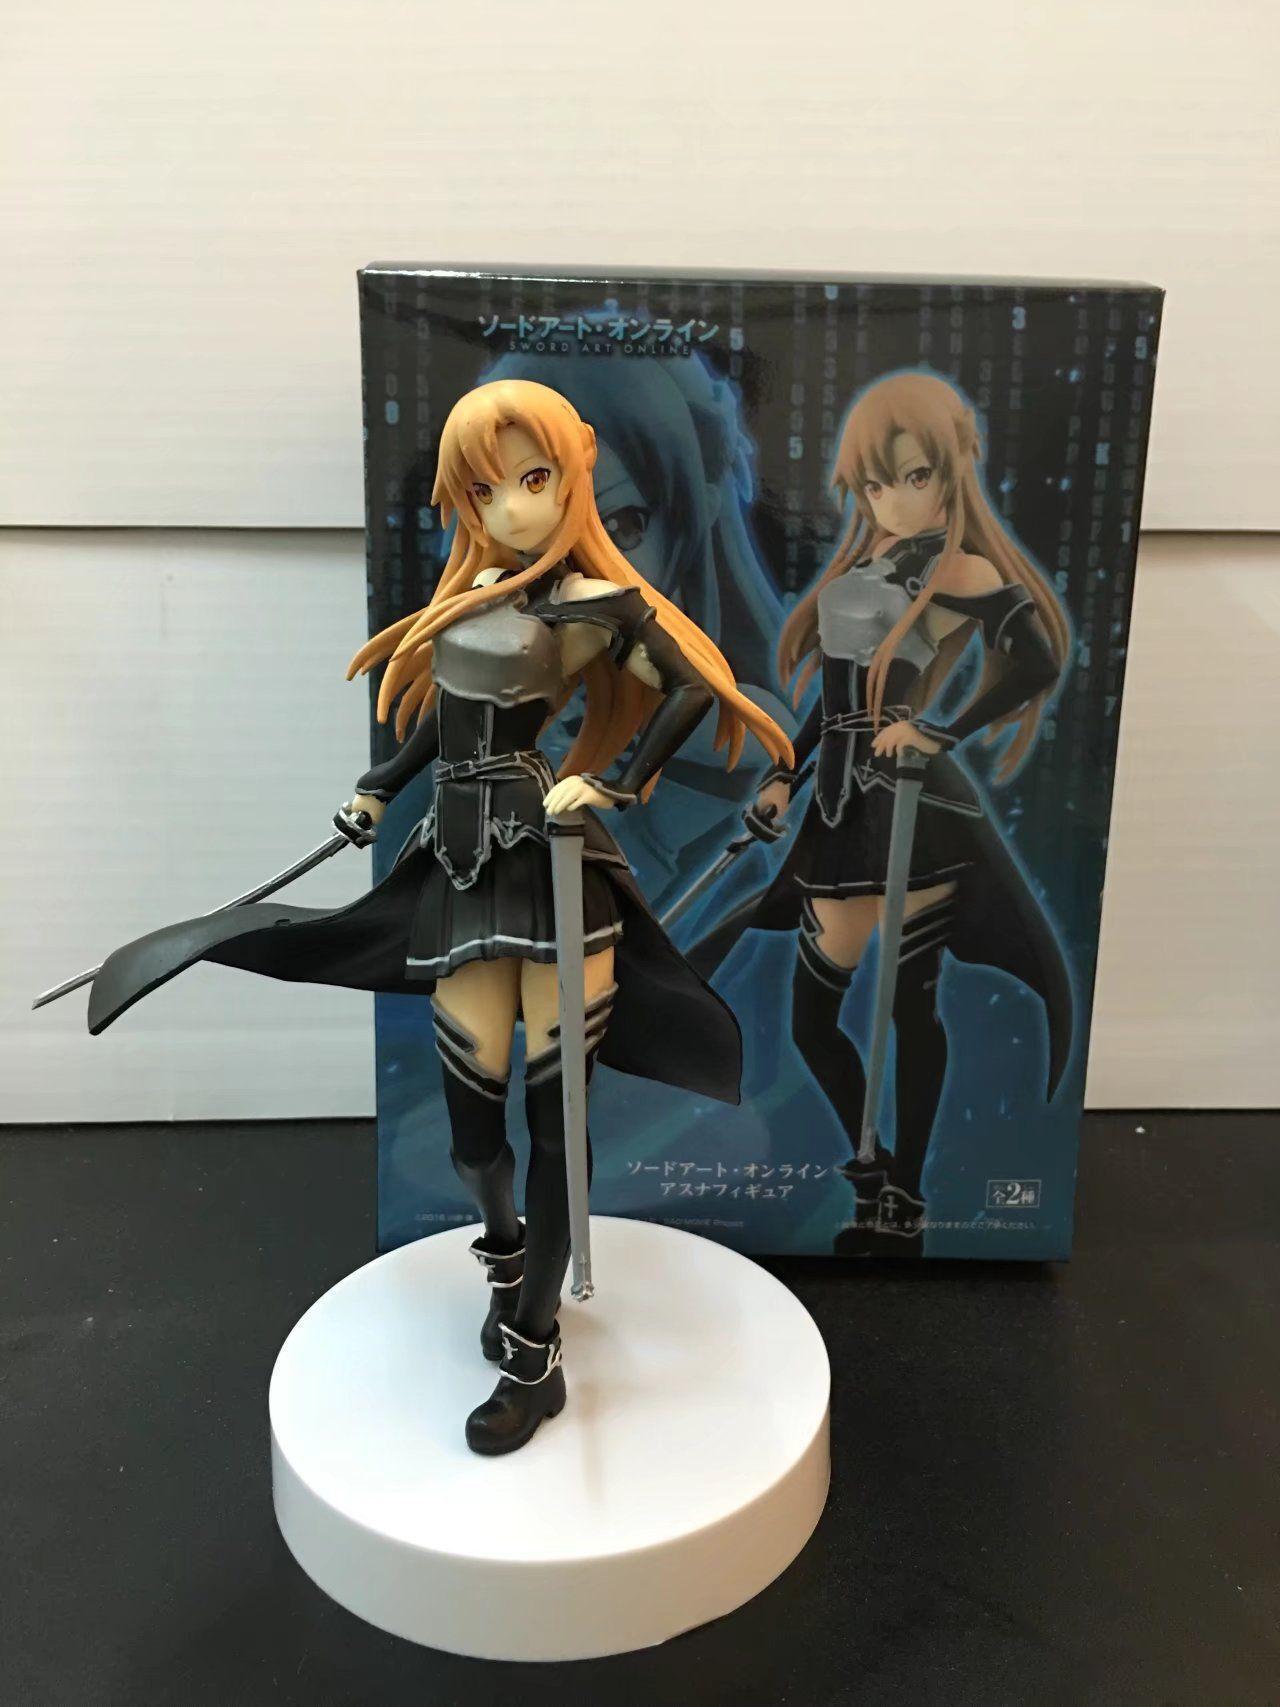 Аниме меч искусство онлайн Yuuki Asuna черная одежда ПВХ фигурка модель игрушка Новинка без коробки